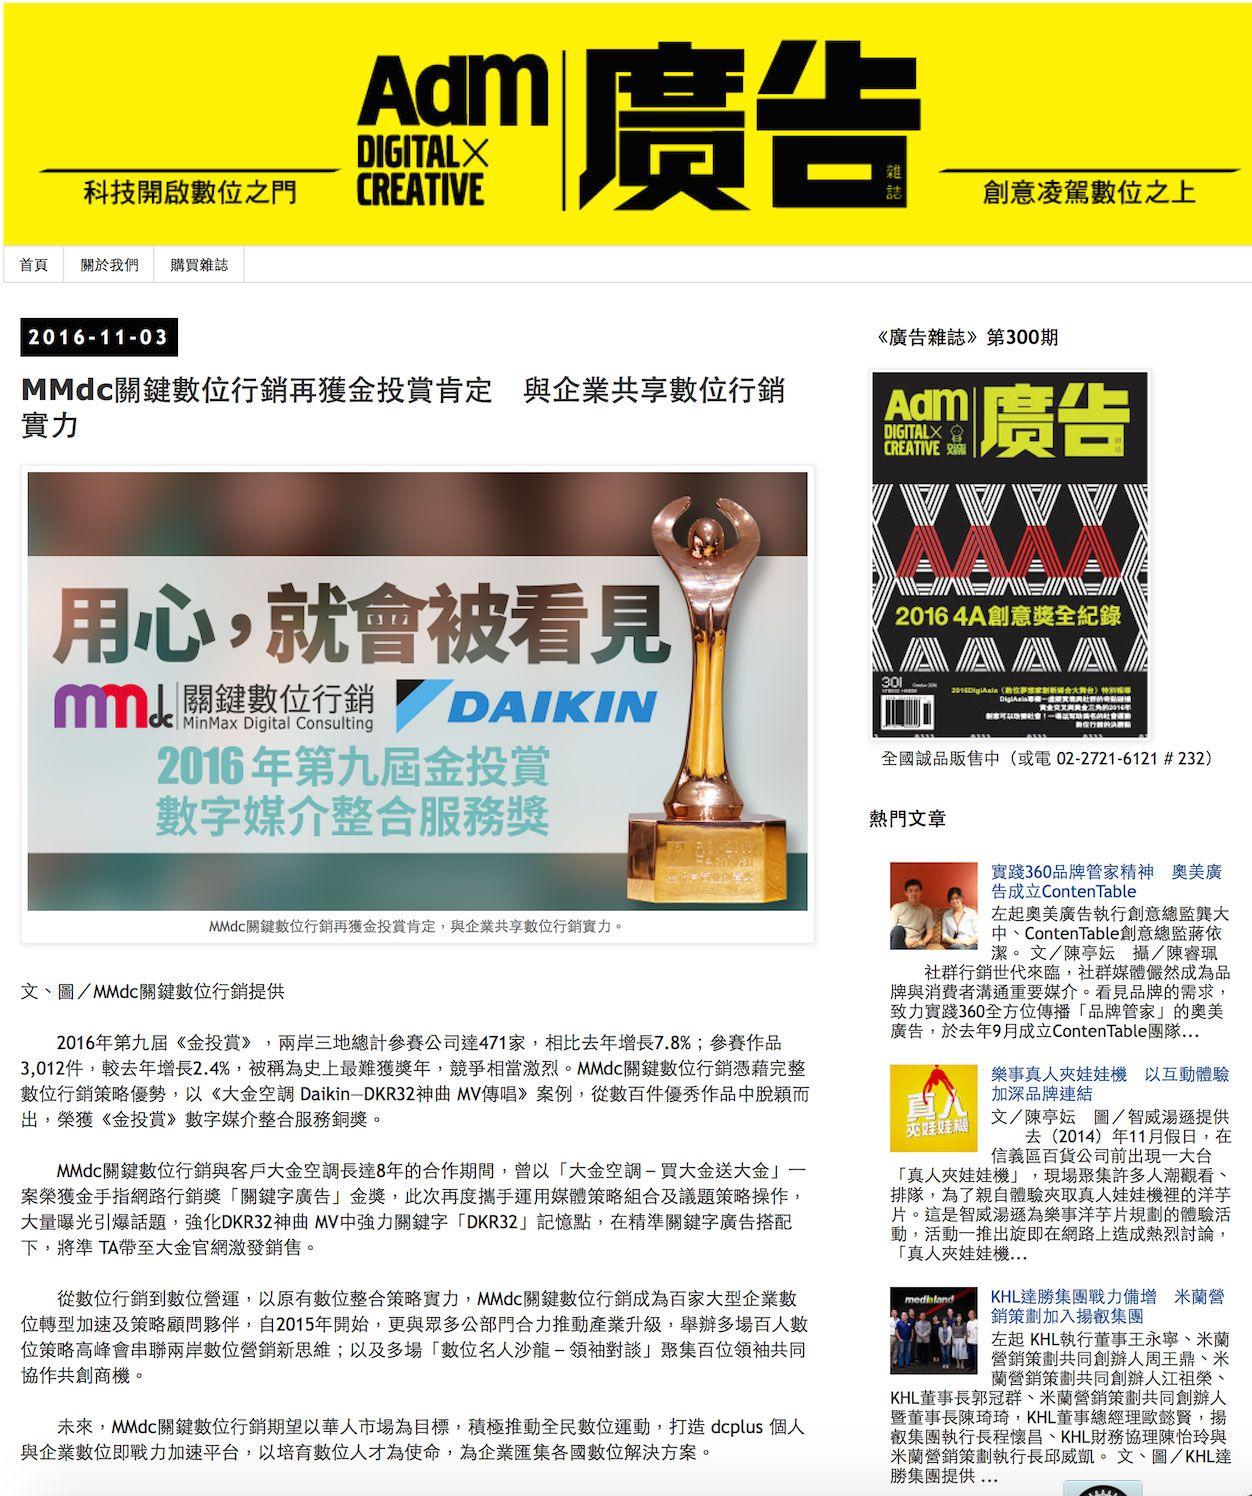 MMdc 再獲金投賞肯定,與企業共享數位營銷實力!